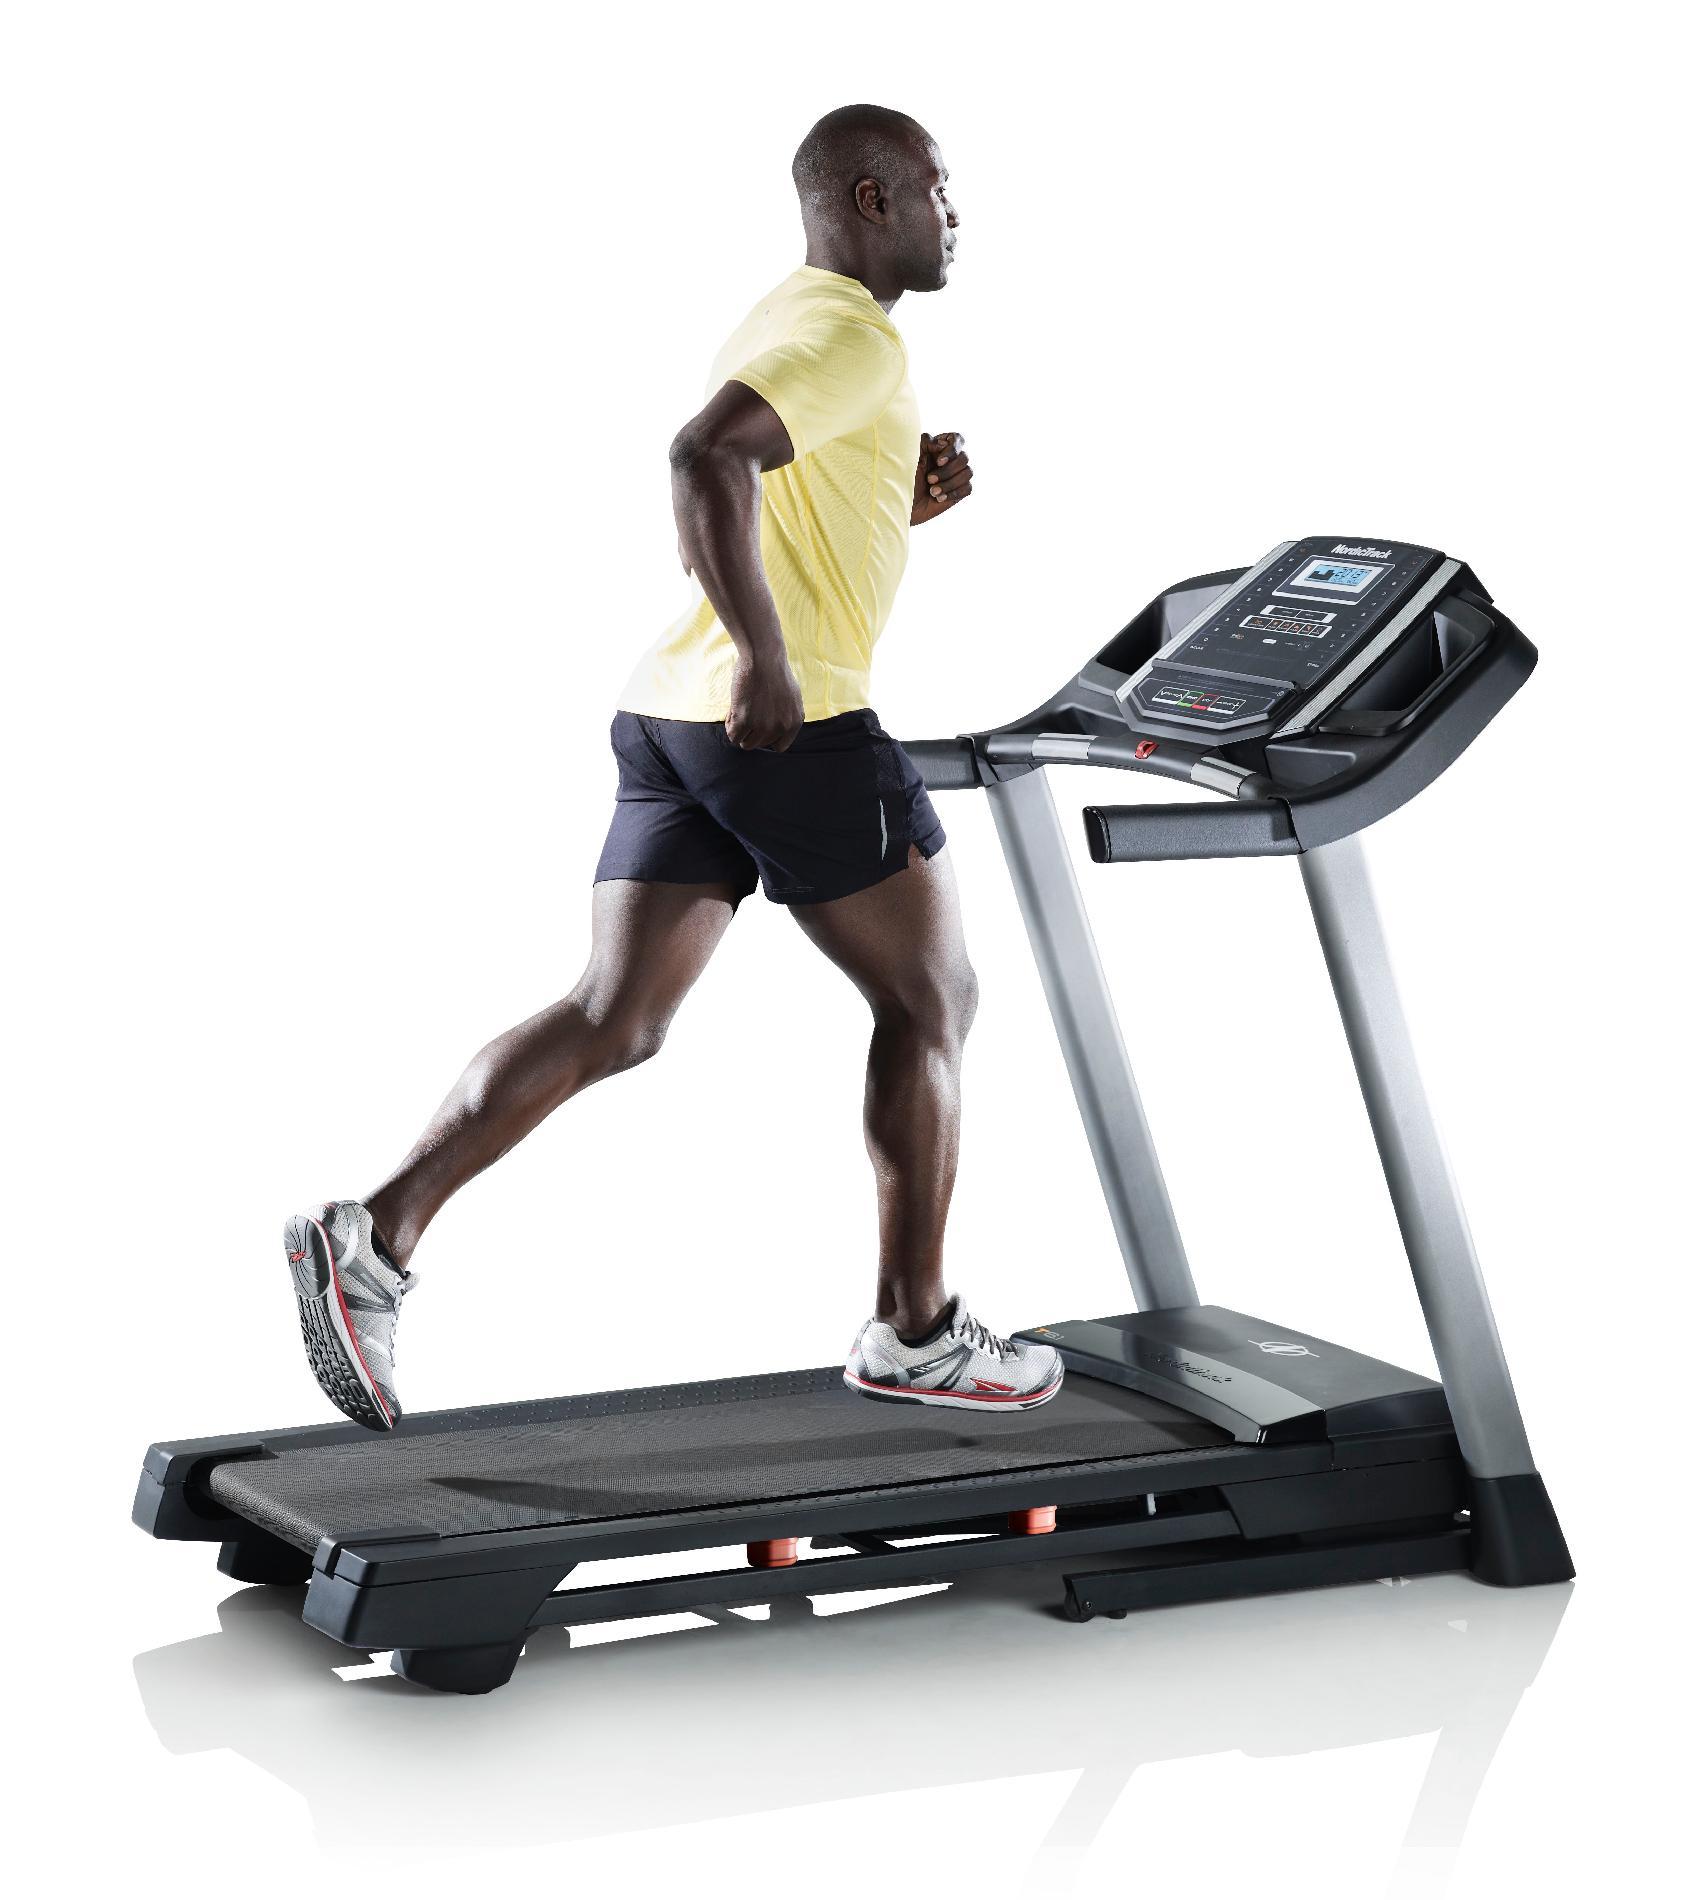 NordicTrack T6.1 Treadmill